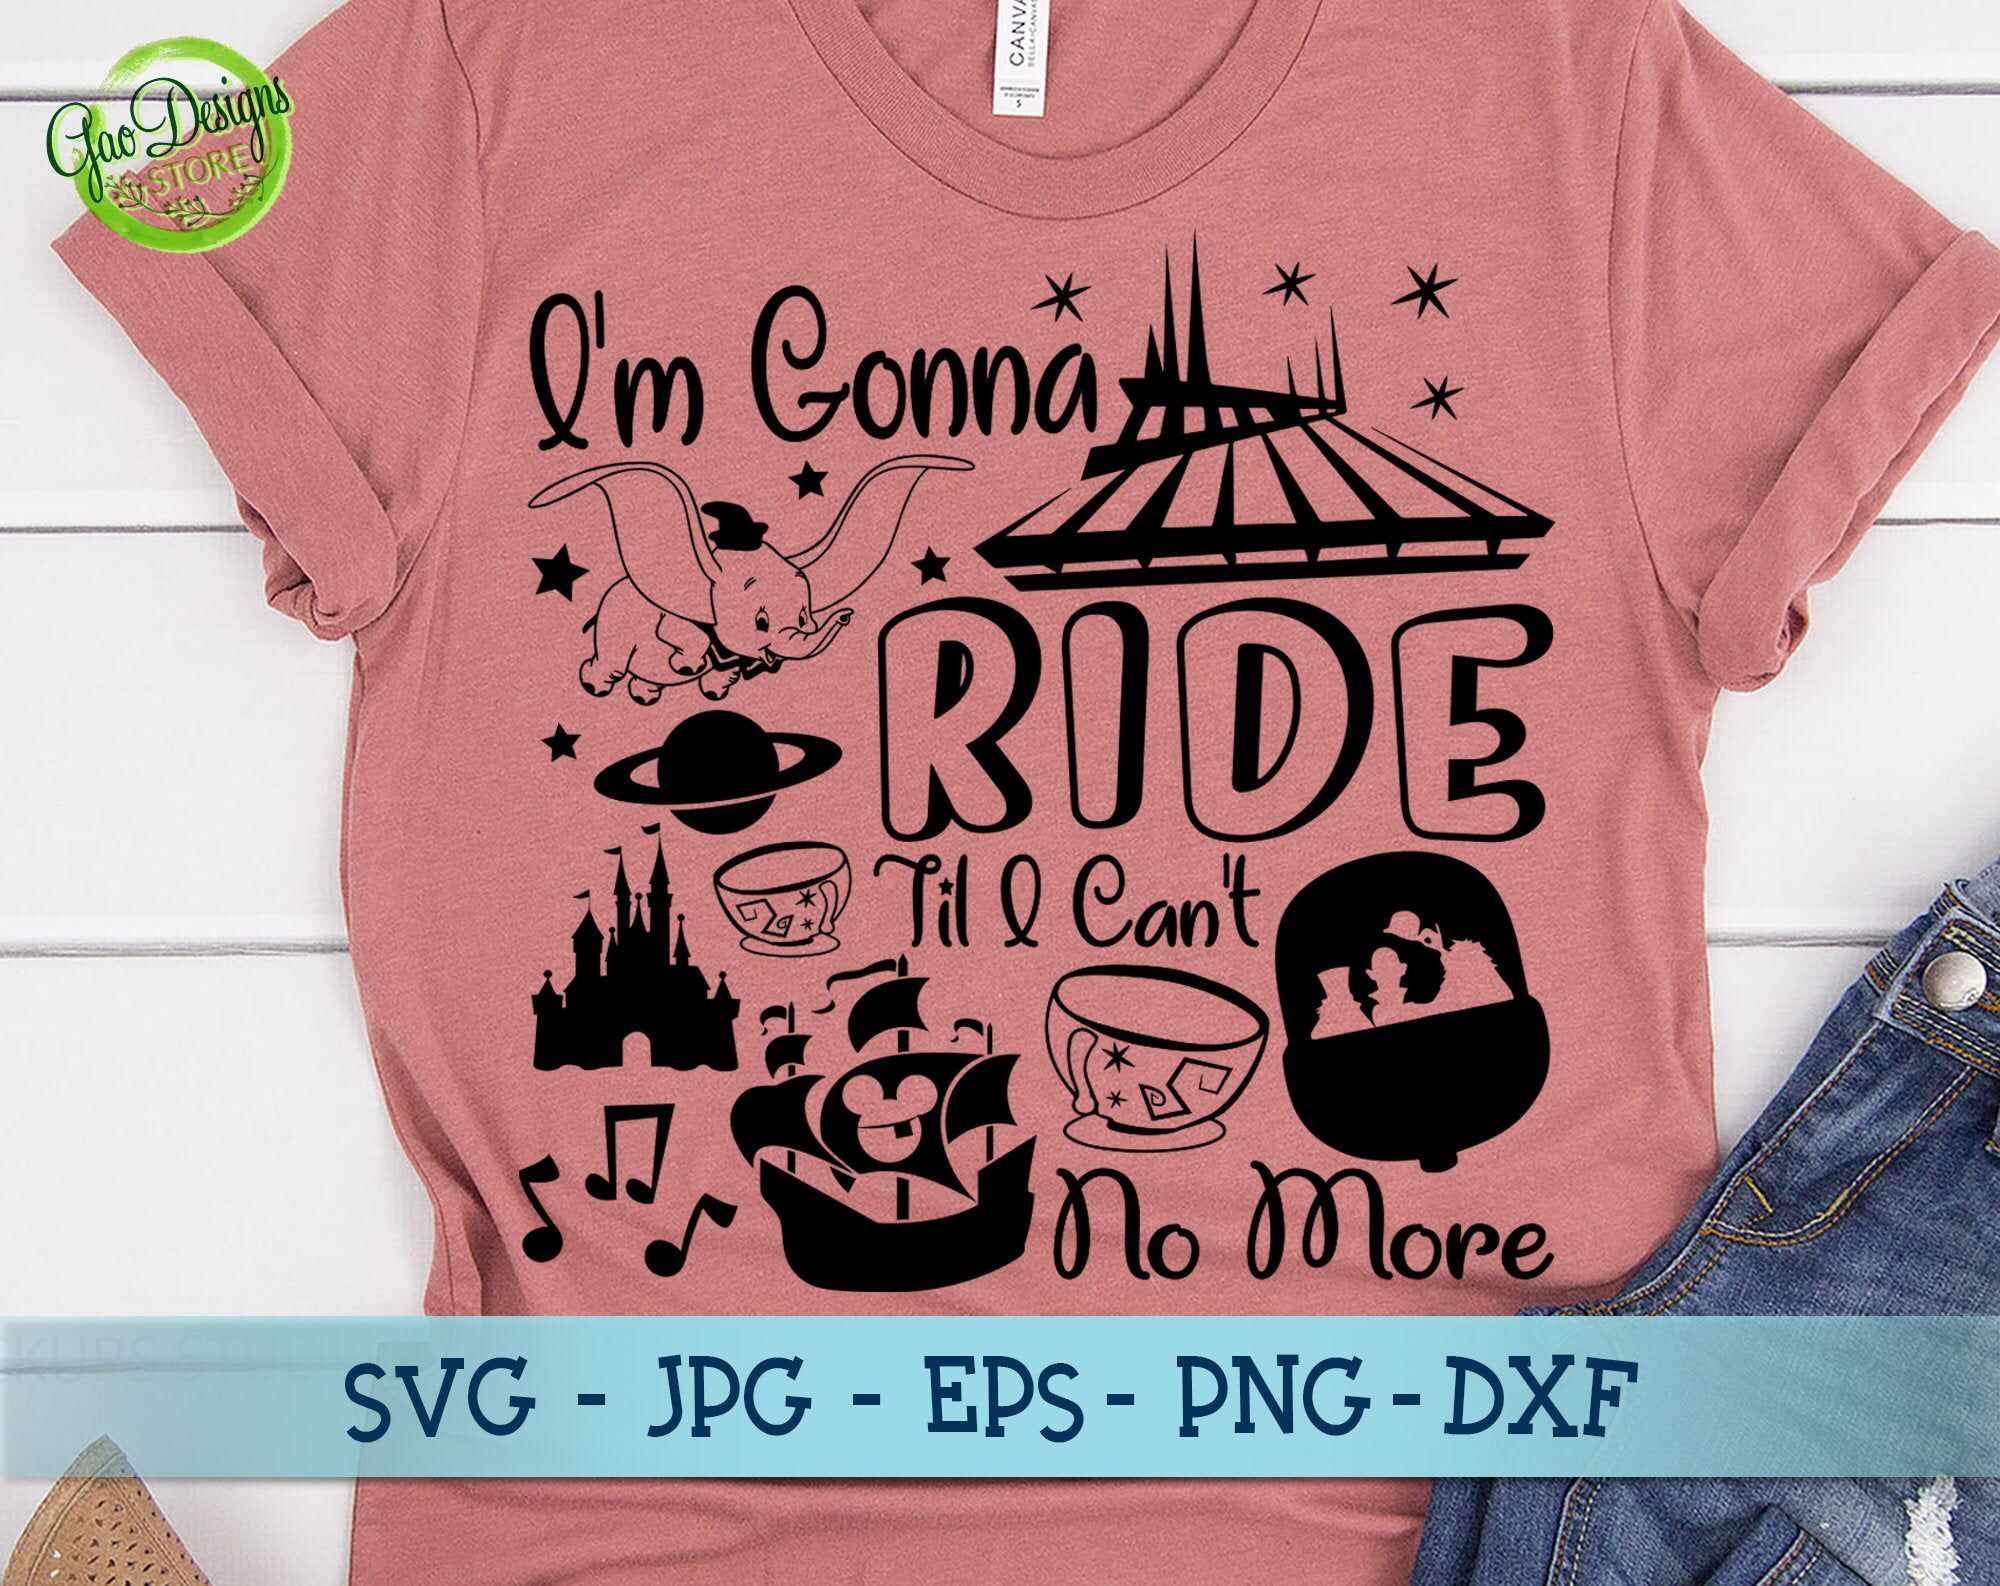 Disney Park Shirt Matching Disney Family Shirts racerback tank Disney Shirts |Disney Rides Shirt. I/'m gonna ride til I can/'t no more